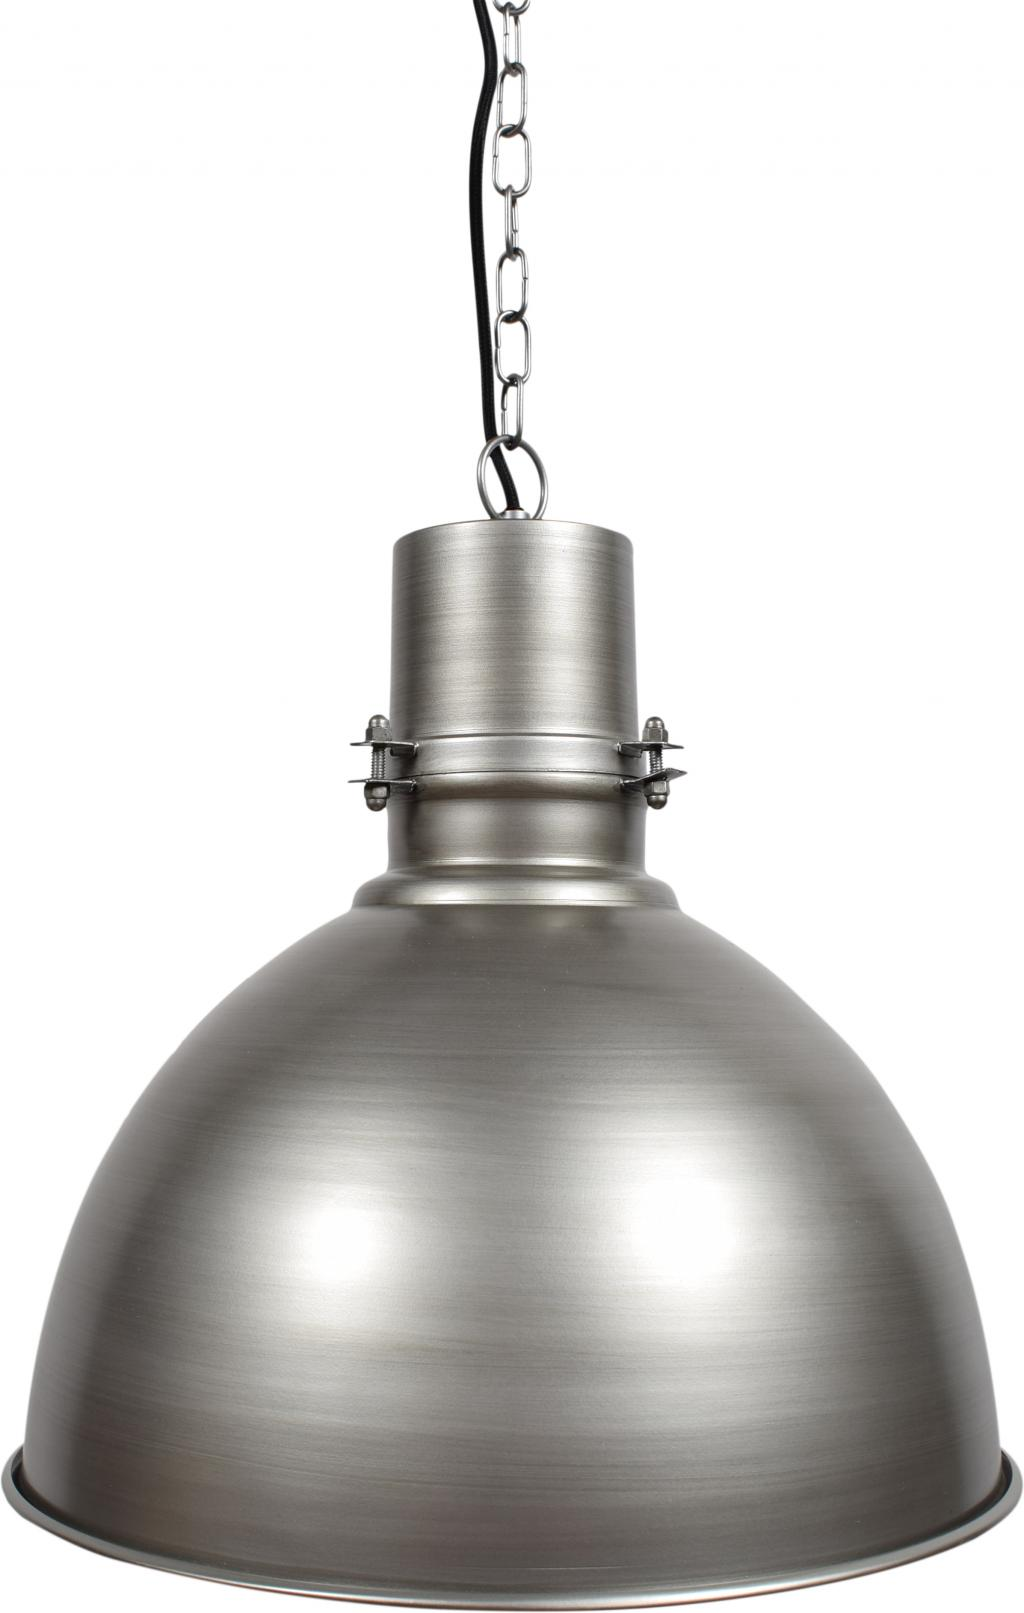 hanglamp-urban---antique-zink---urban-interiors[0].jpg